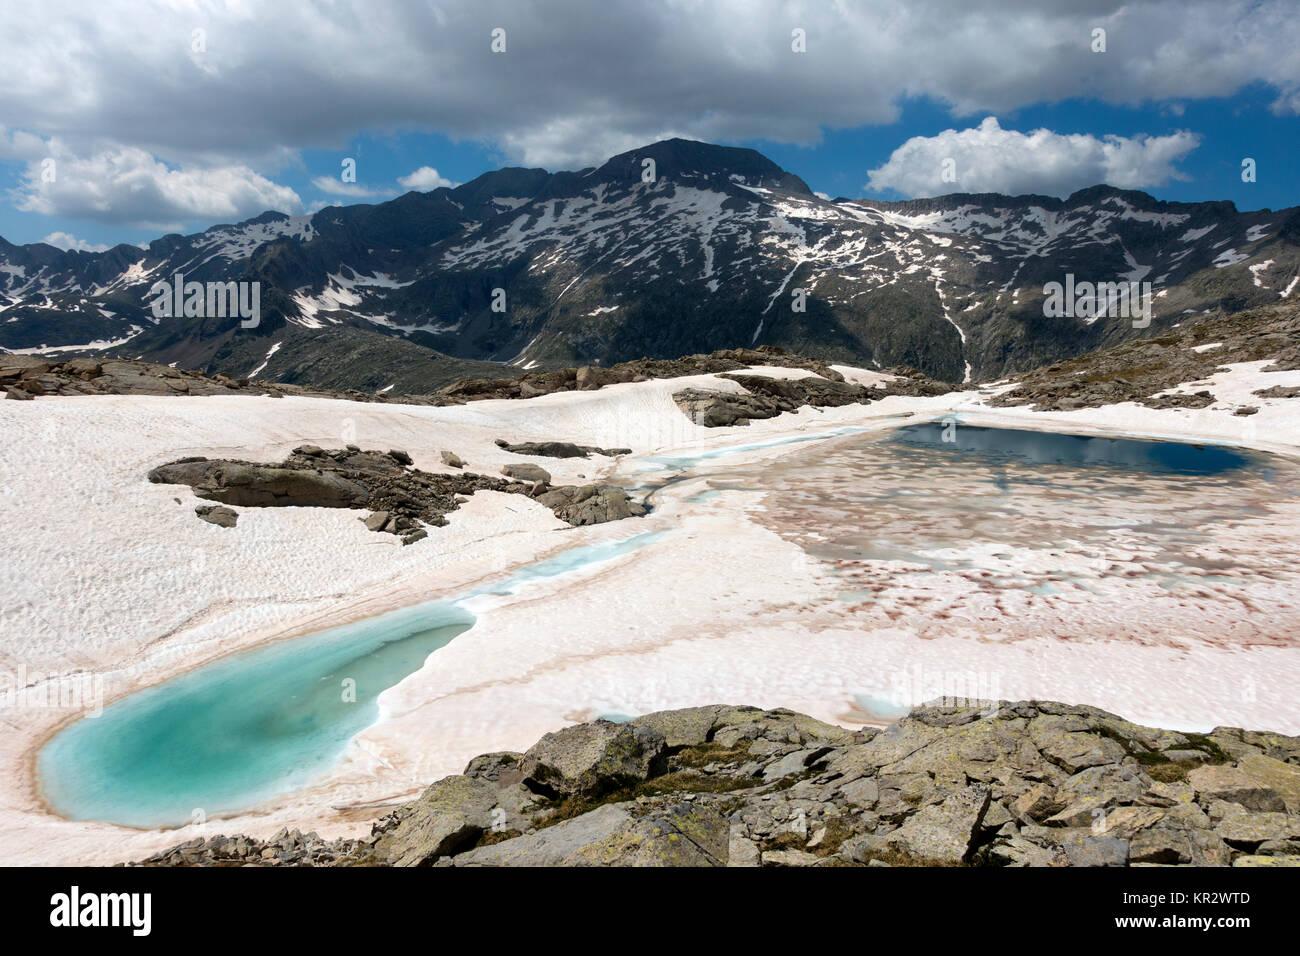 Posets-Maladeta Natural Park,Pyrenees.Spain - Stock Image